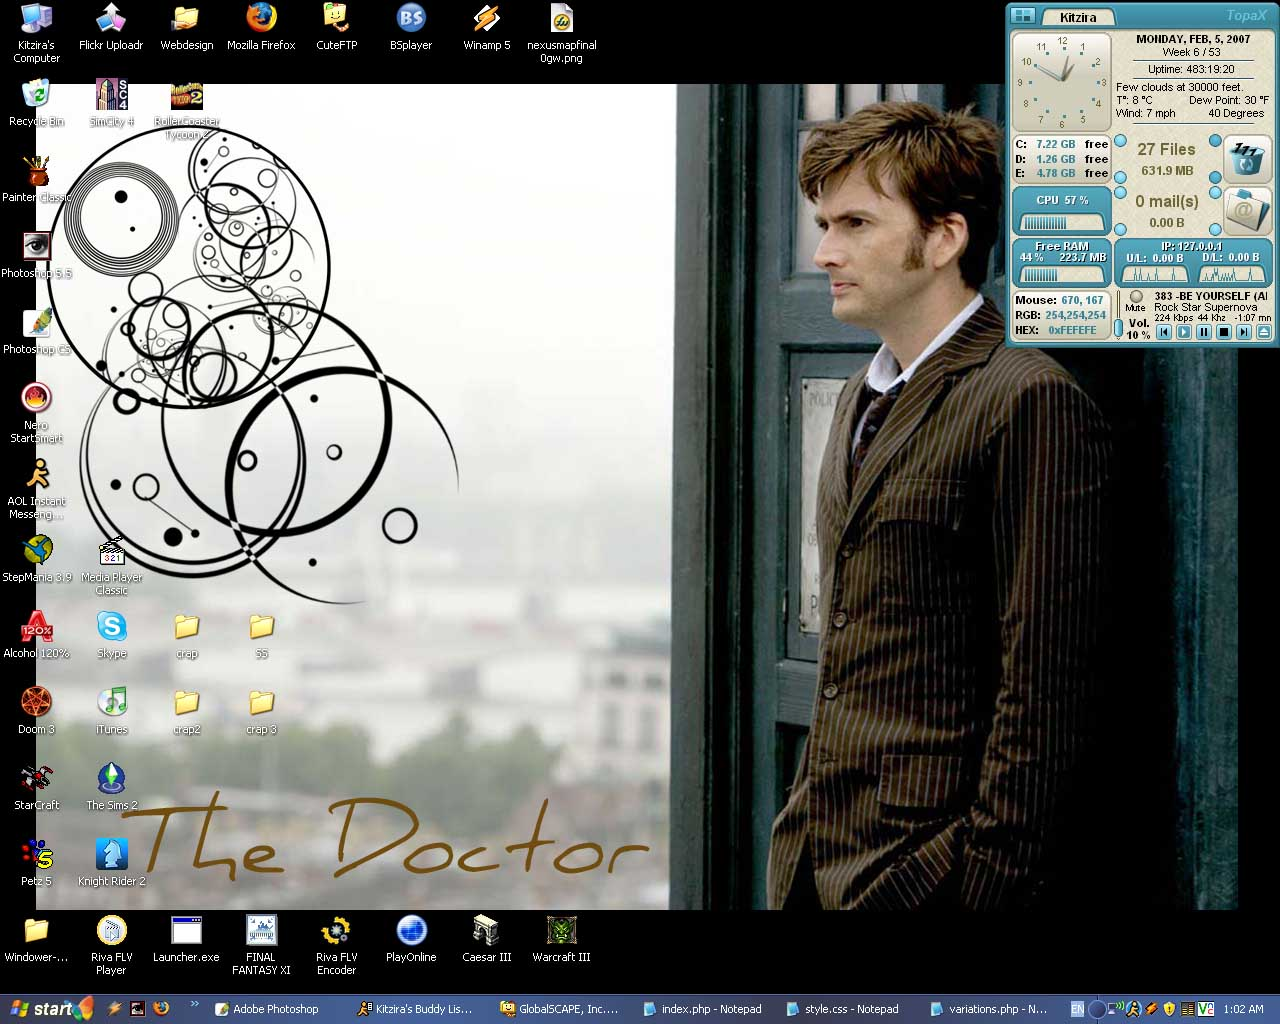 Feb. '07 Desktop by Kitzira